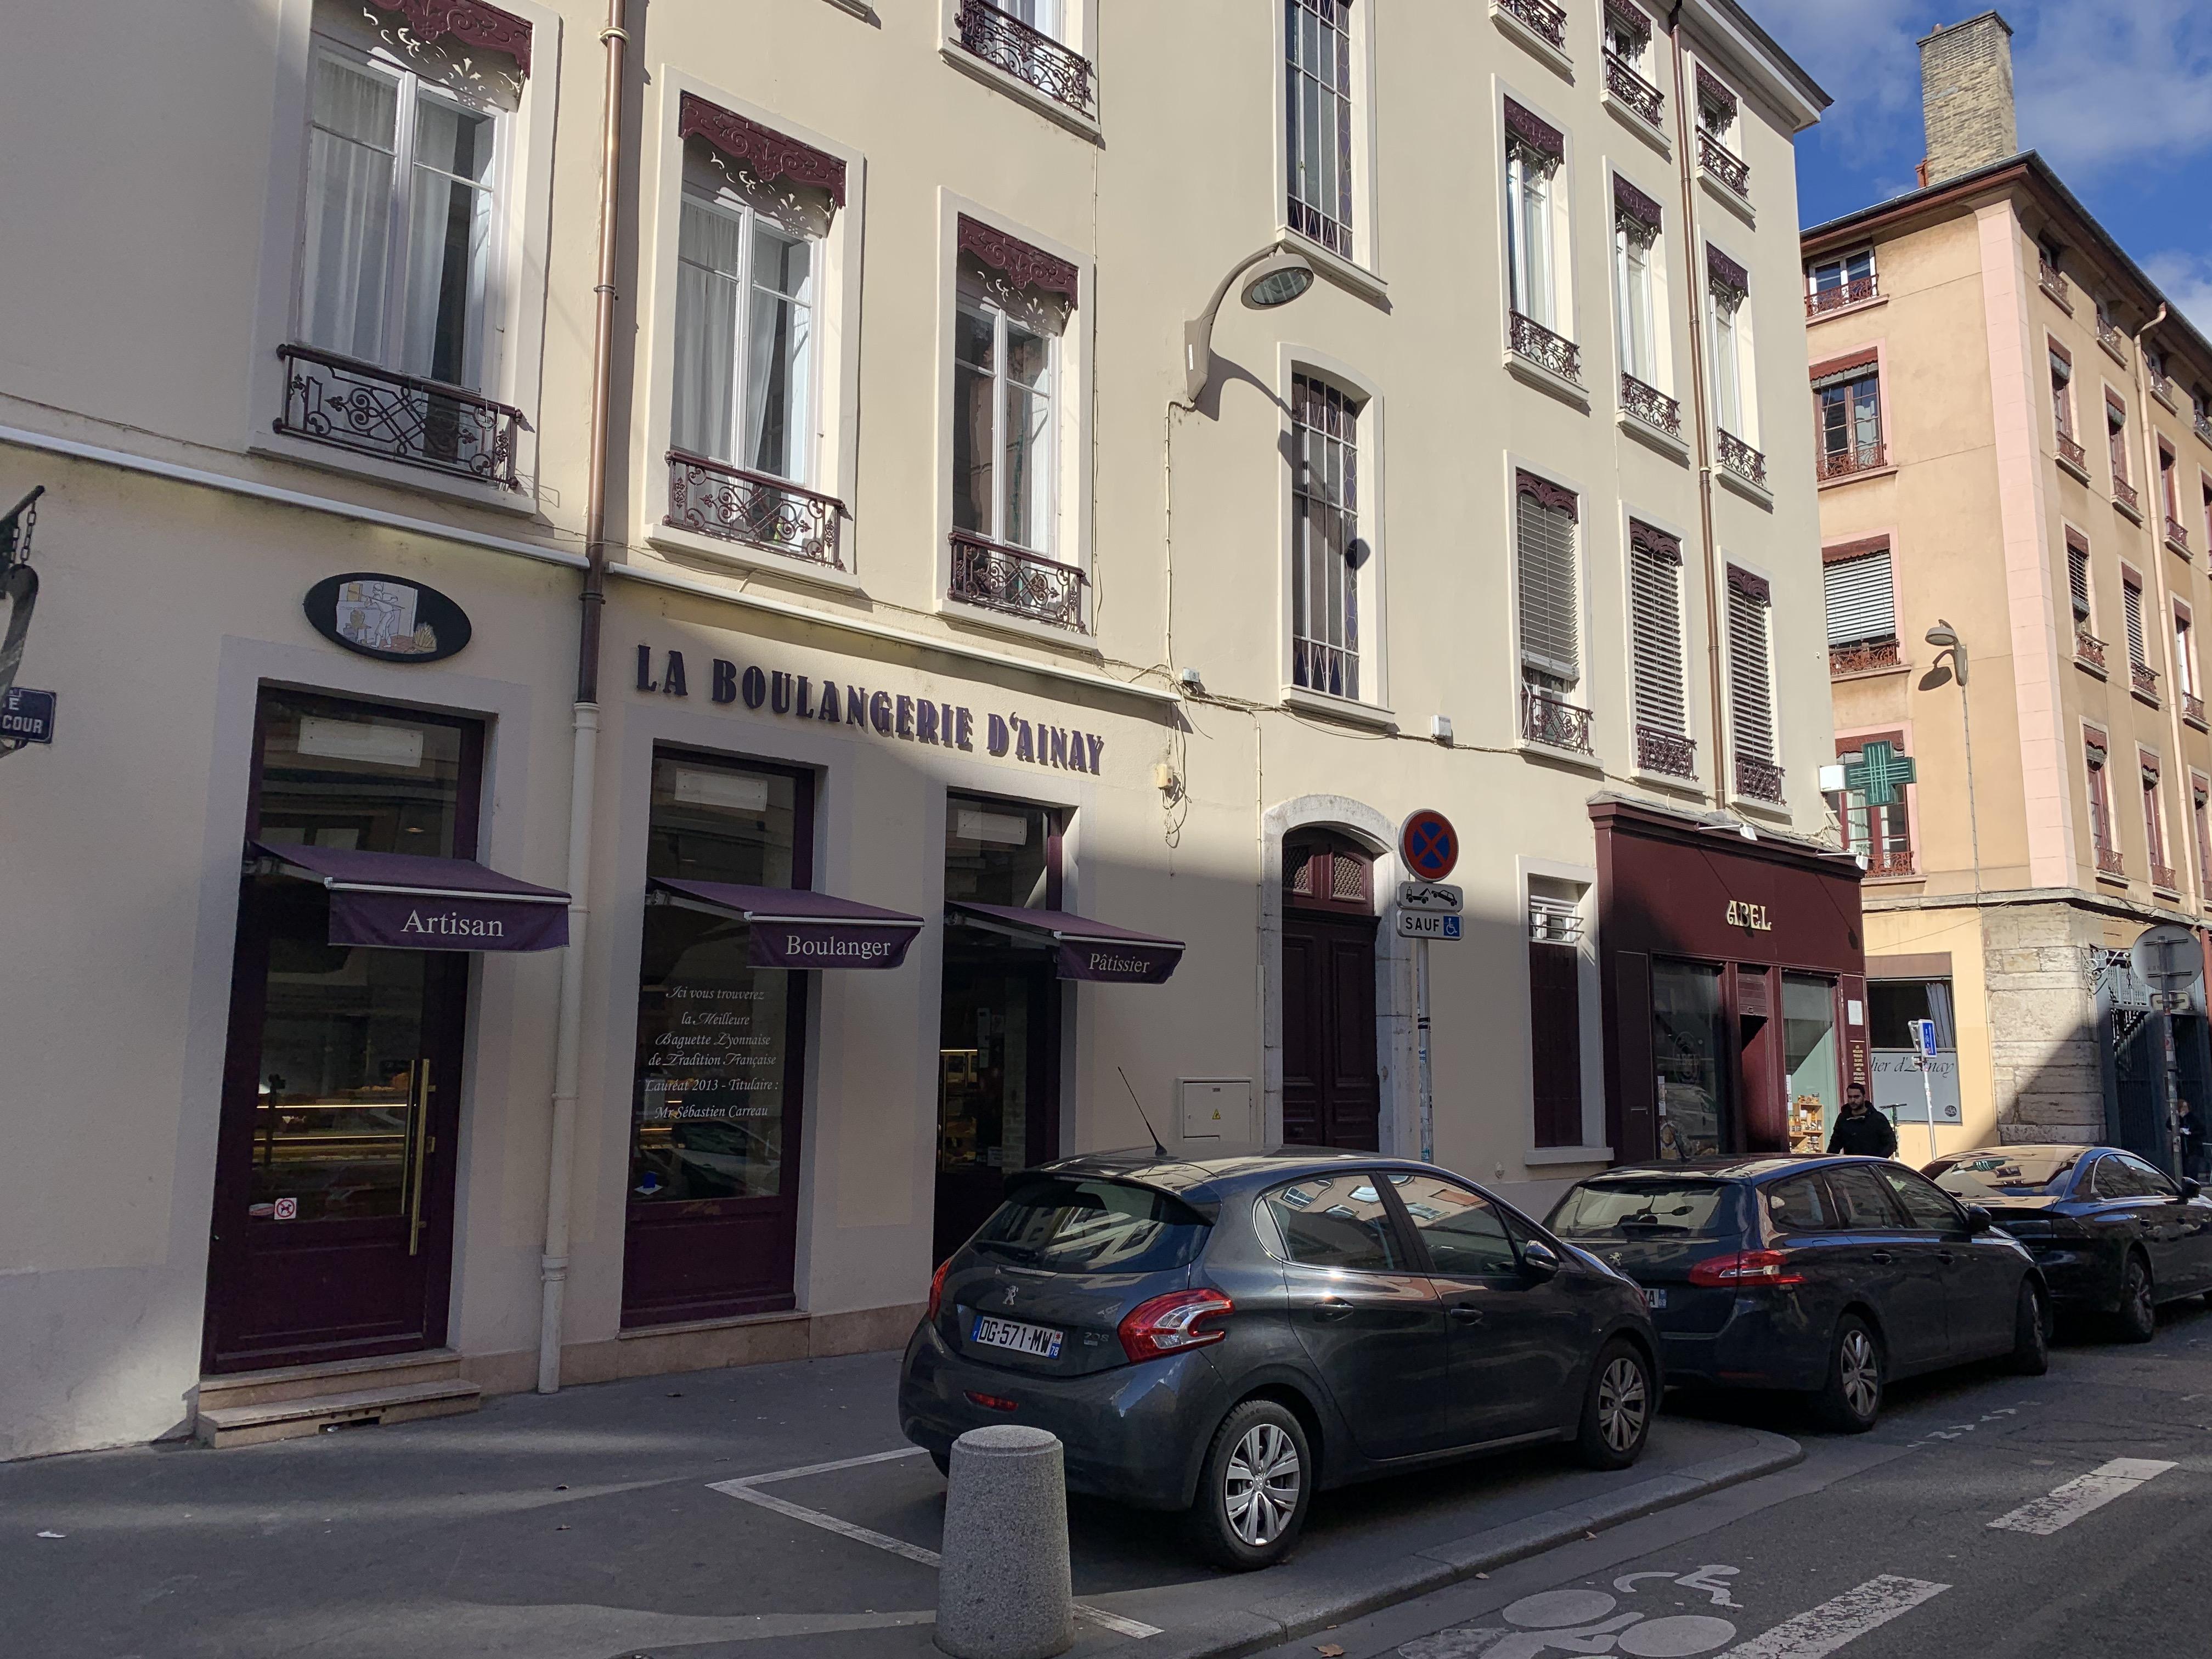 rue Vaubecourd Boulangerie Ainay